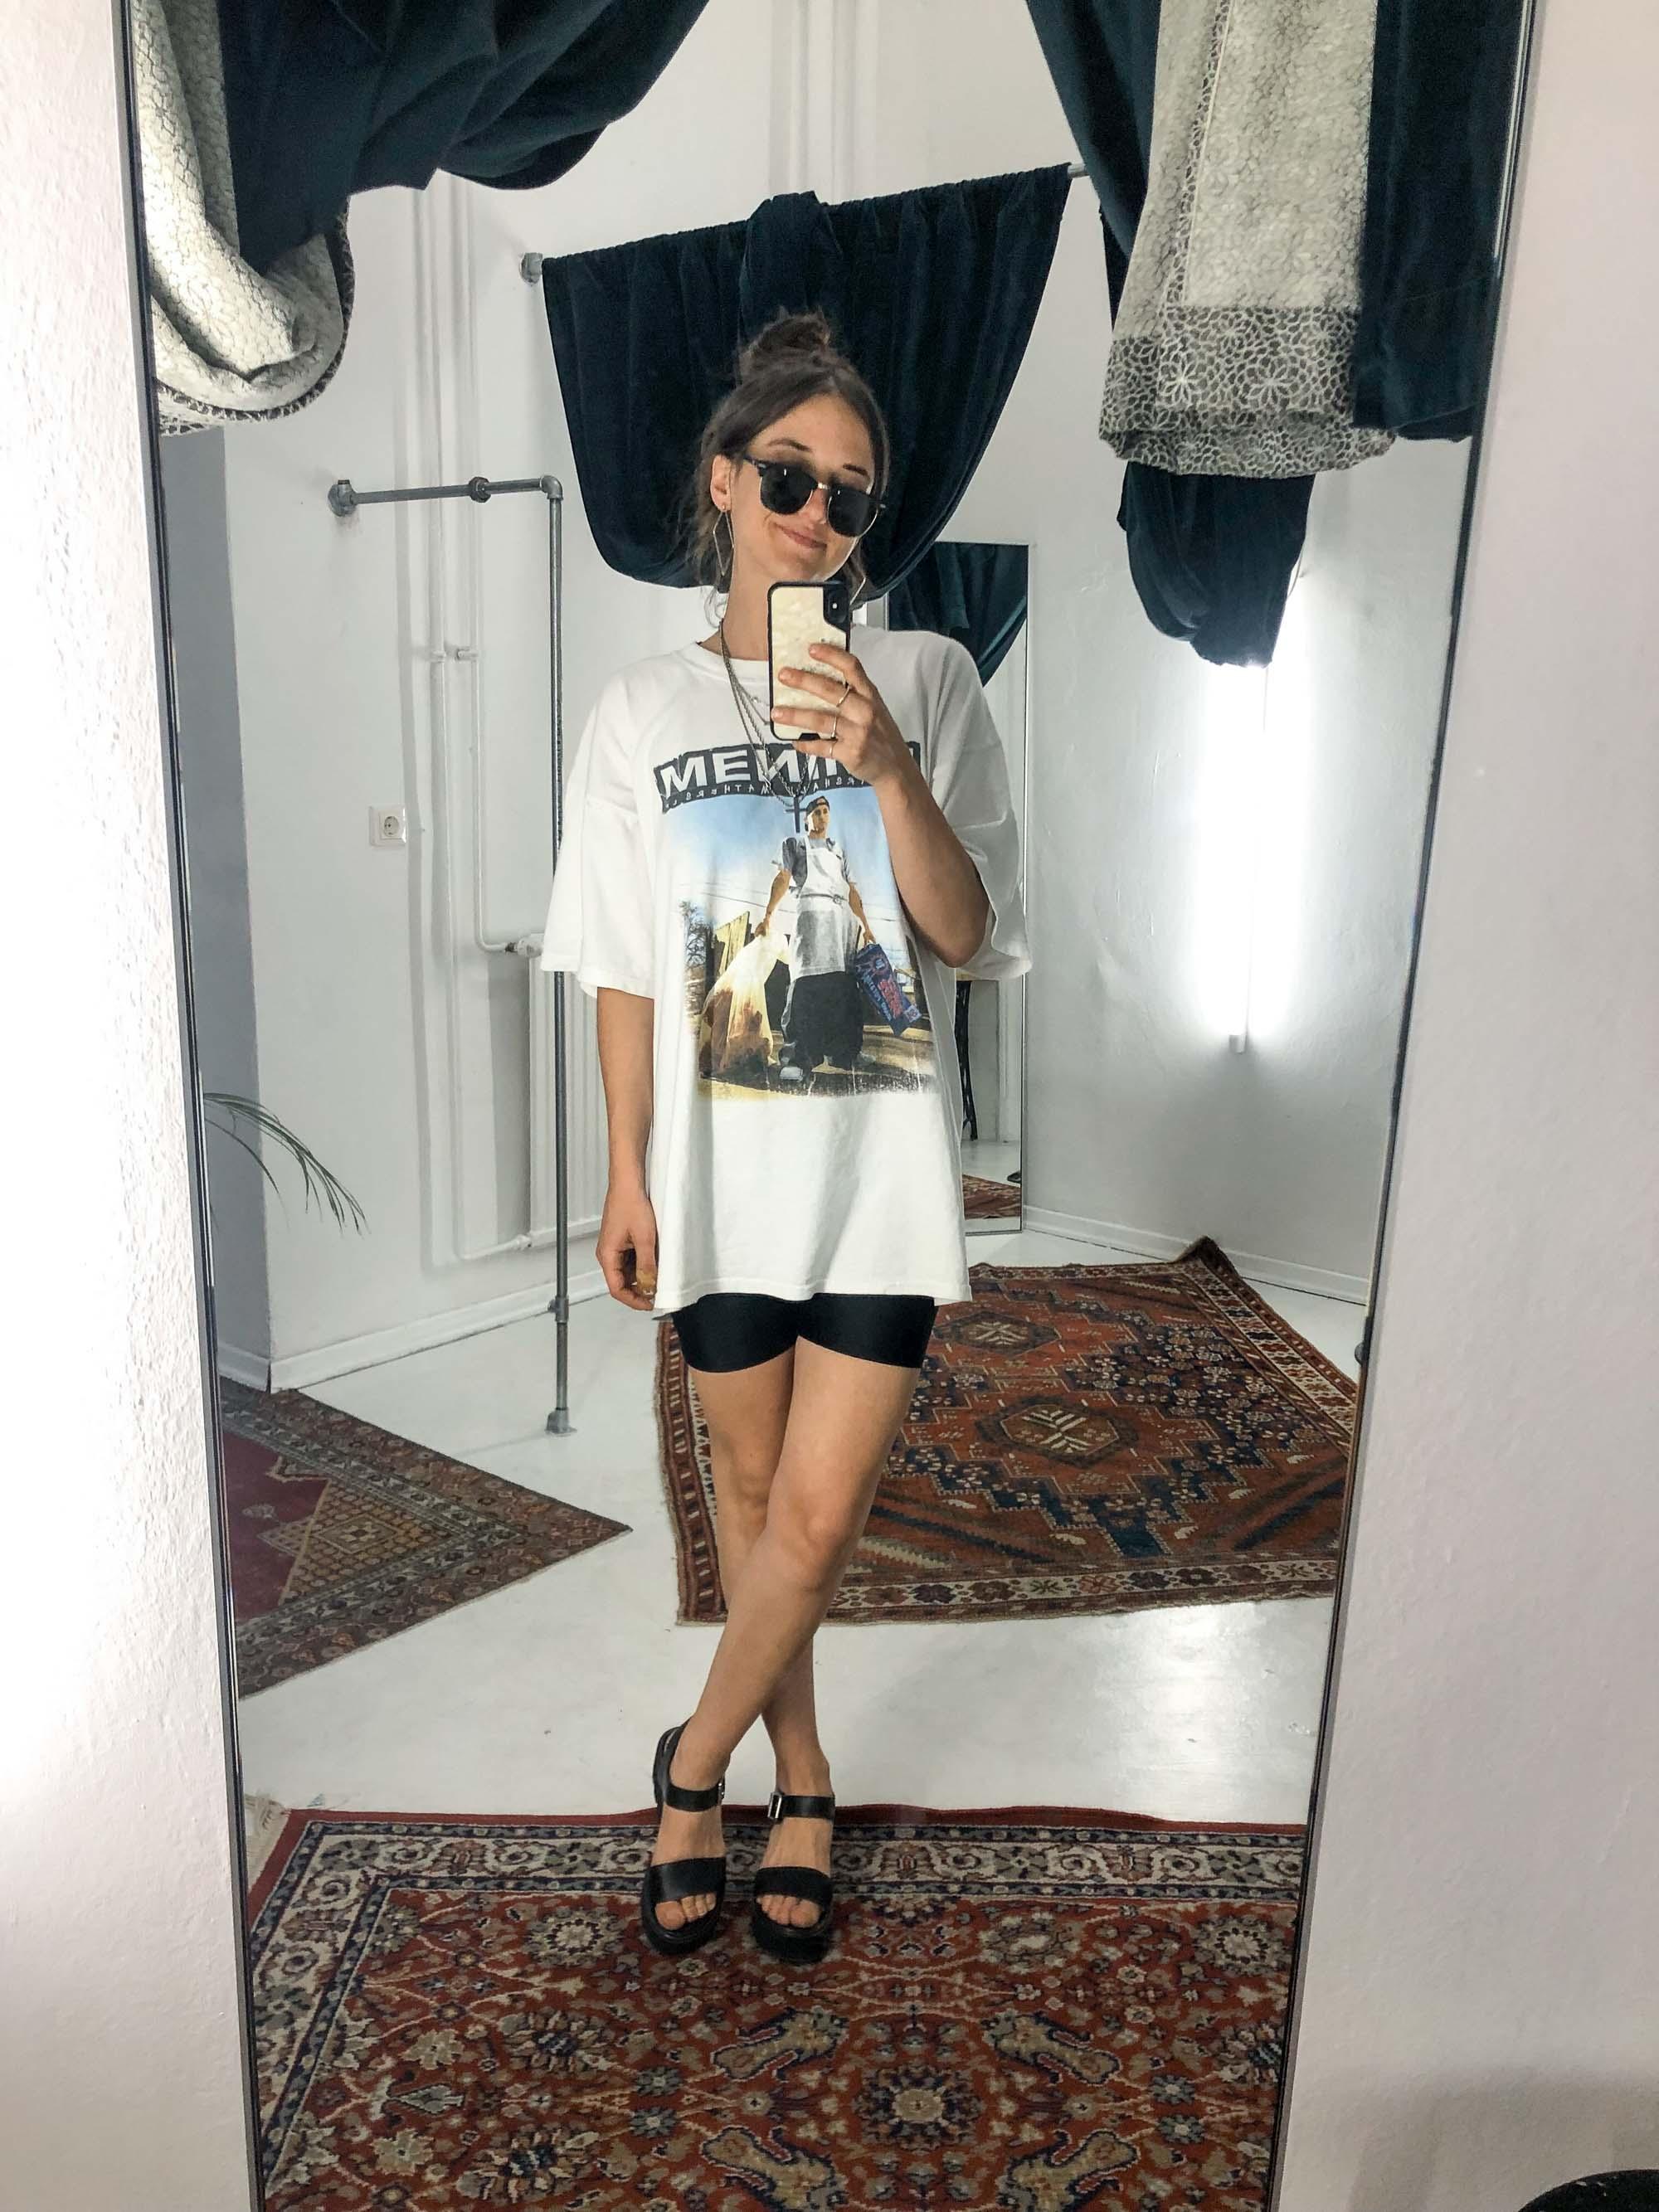 Johannas Office Looks im Juli – Vintage Outfit Inspiration mit Eminem Band T-Shirt